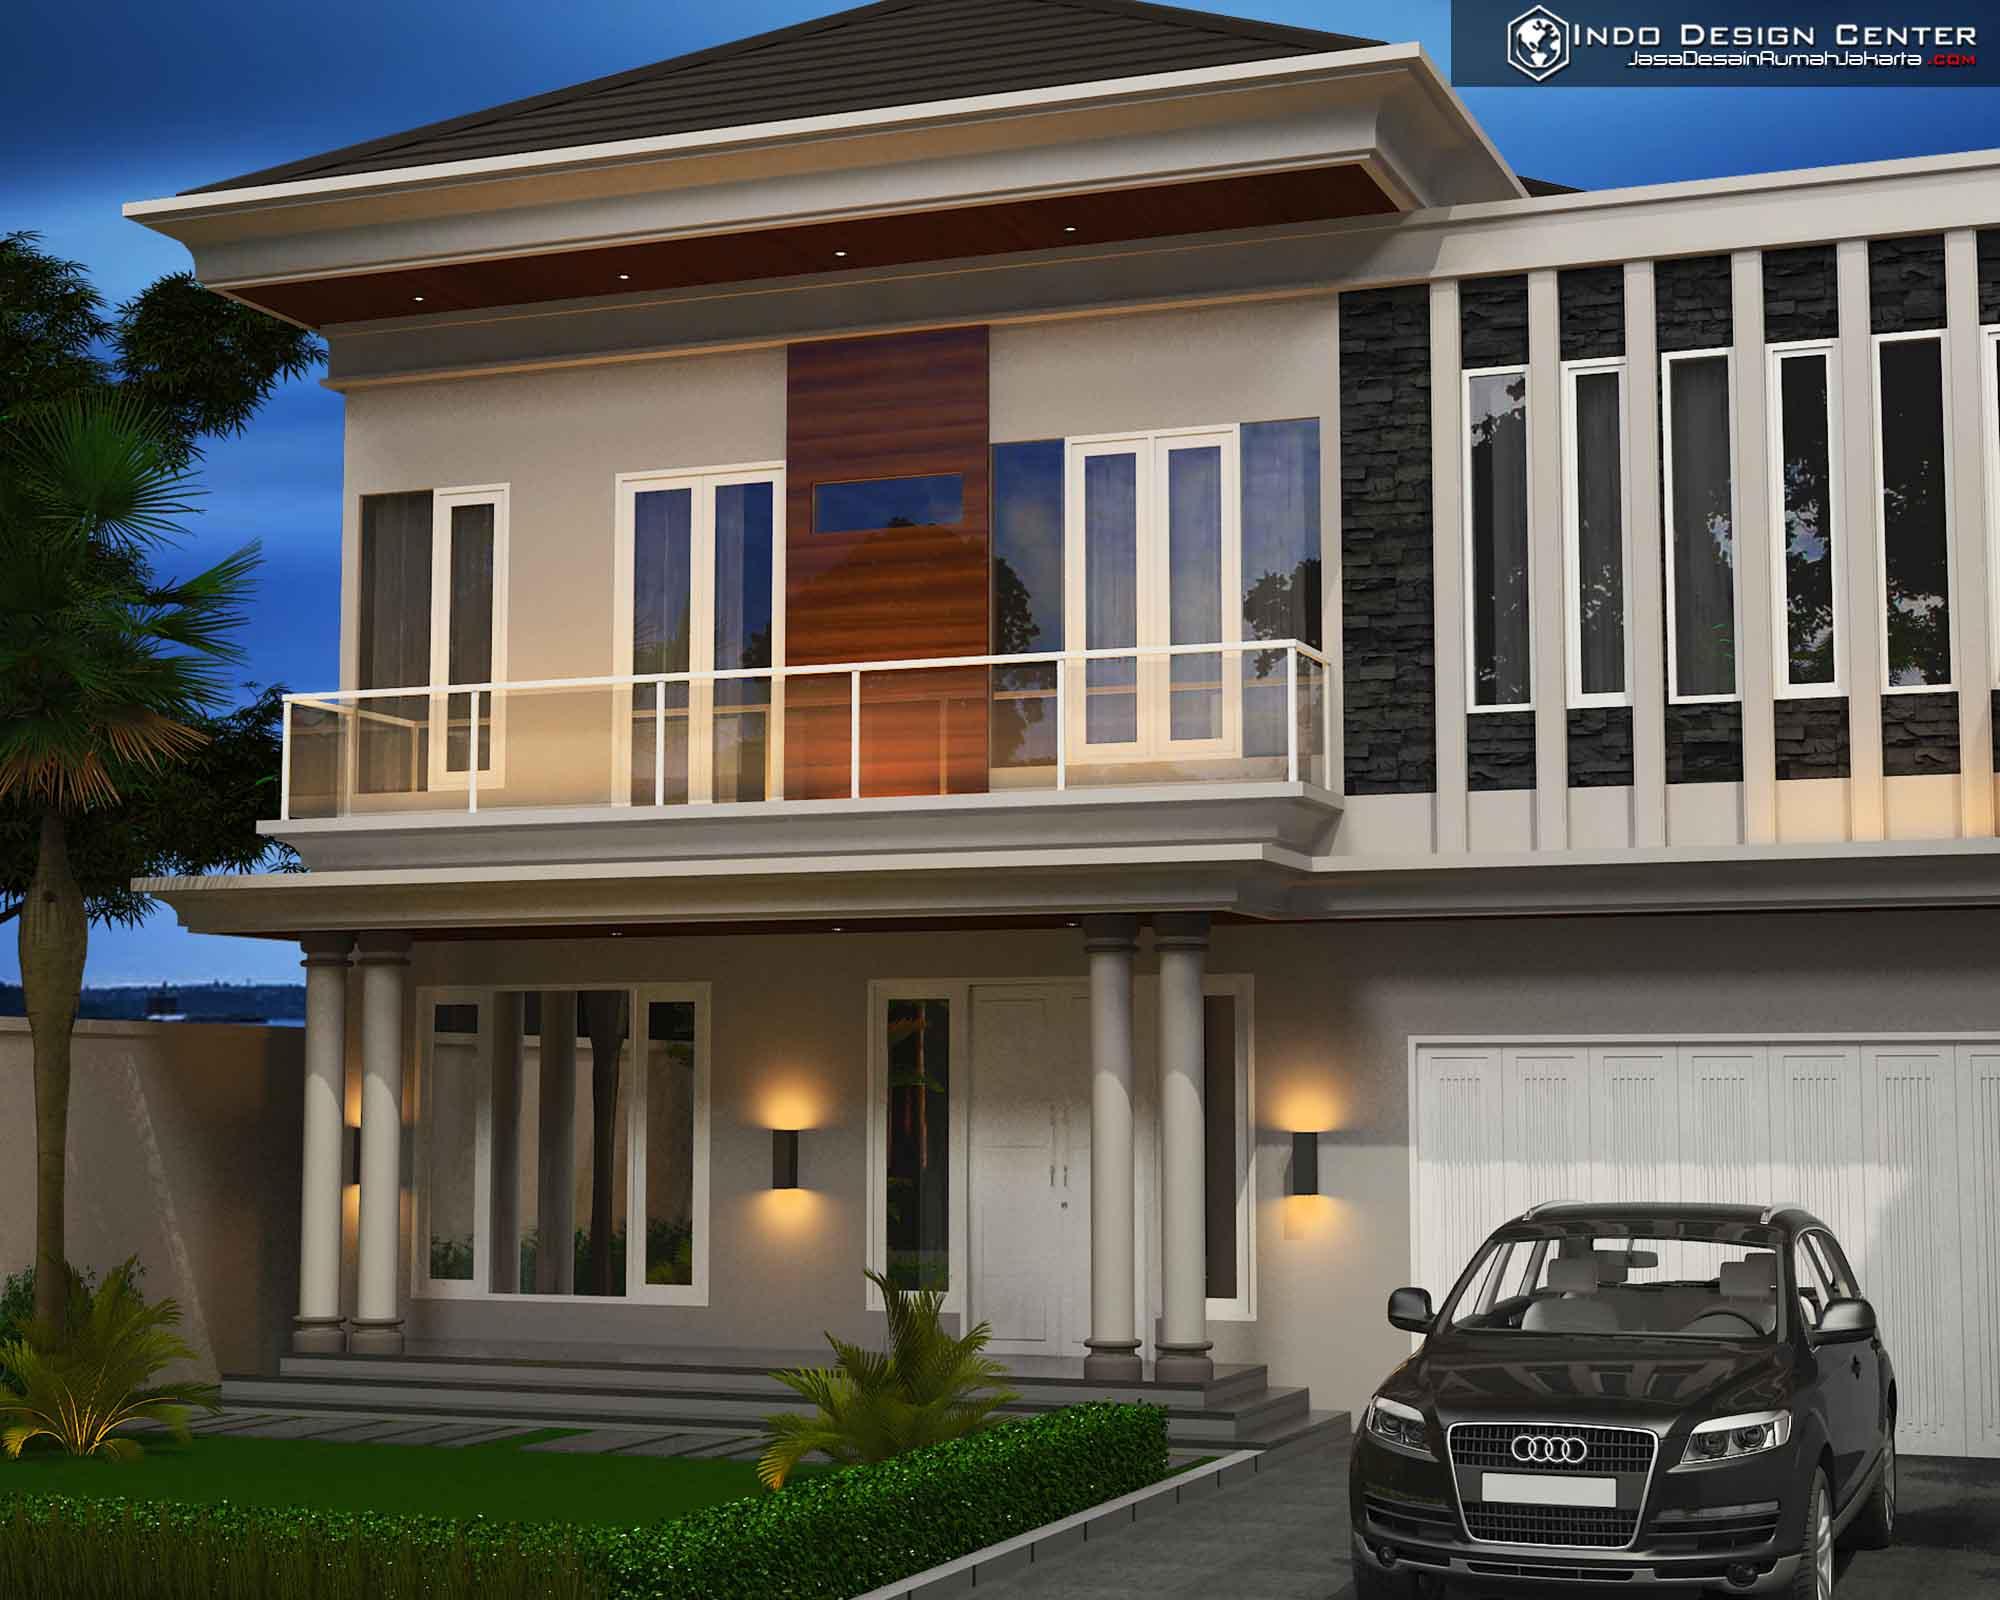 Gambar Rumah Modern Minimalis 2 Lantai Jasa Desain Rumah Jakarta